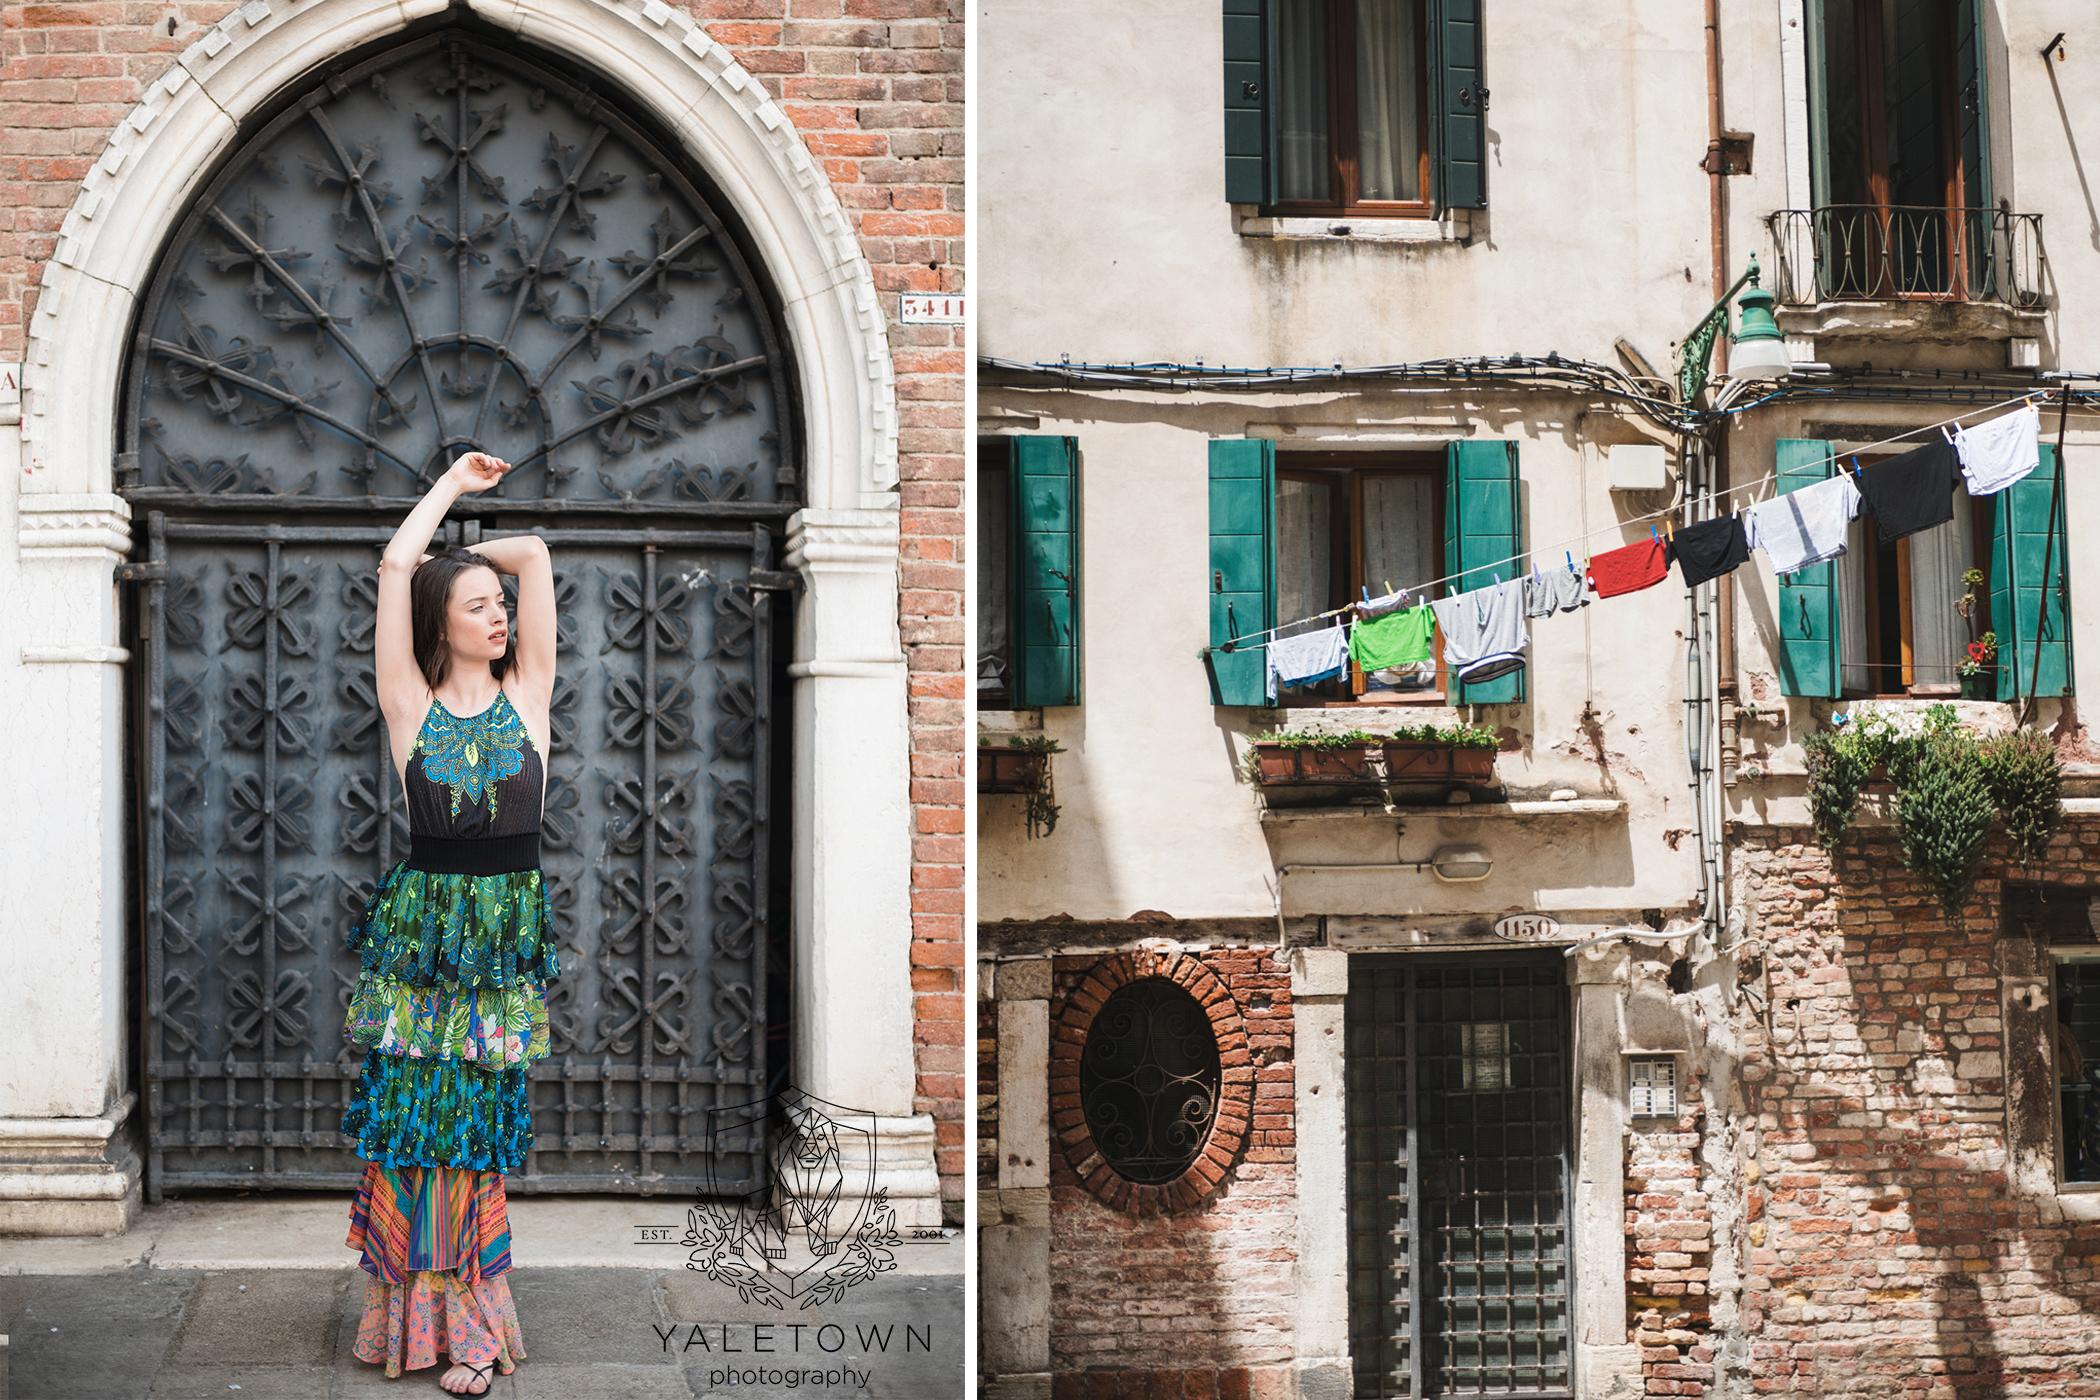 Venice-portrait-session-yaletown-photography-vacation-photographer-photo-015.jpg